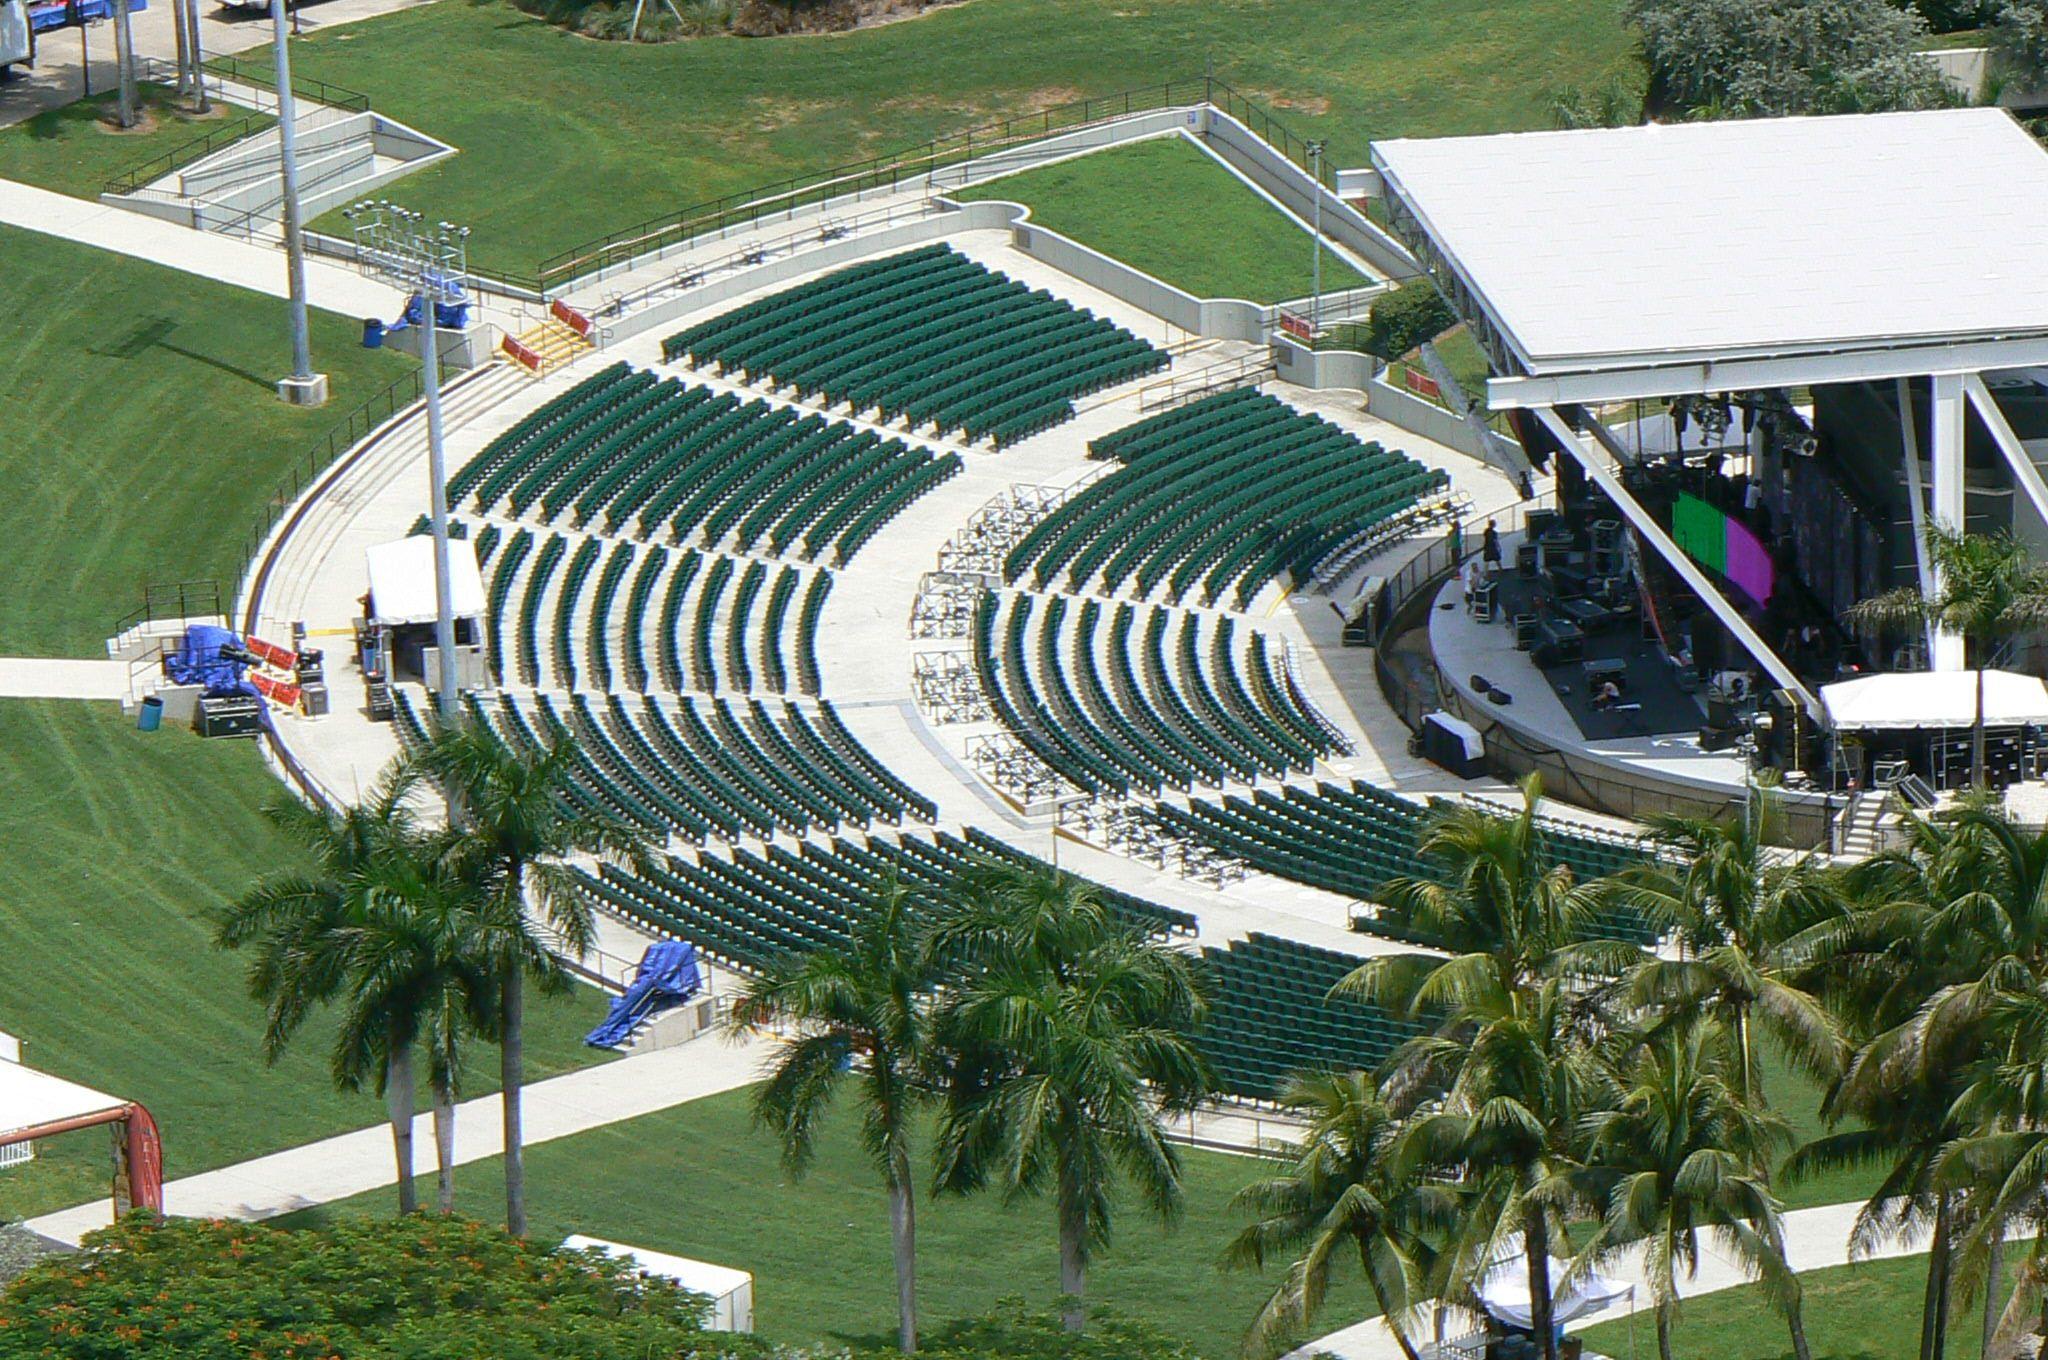 Klipsch Bayfront Park Amphitheater Miami Beach Real Estate Miami Real Estate Seating Charts